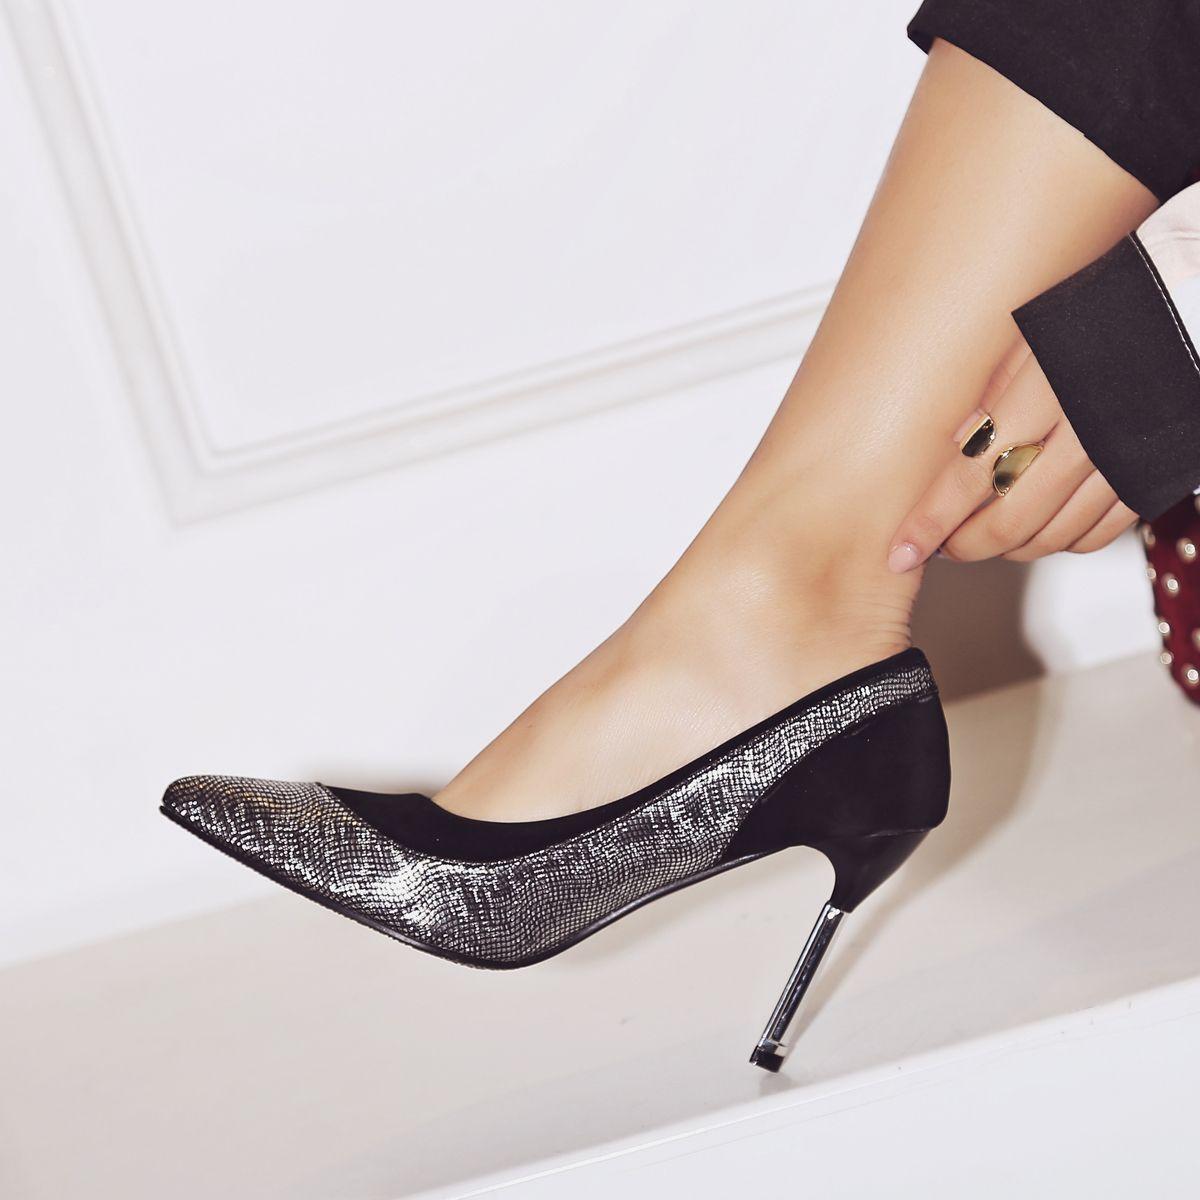 2018 Trendy Hot Sale Low Price 90mm Golden Sliver Women High Heels Stiletto Lady Dressing Pumps